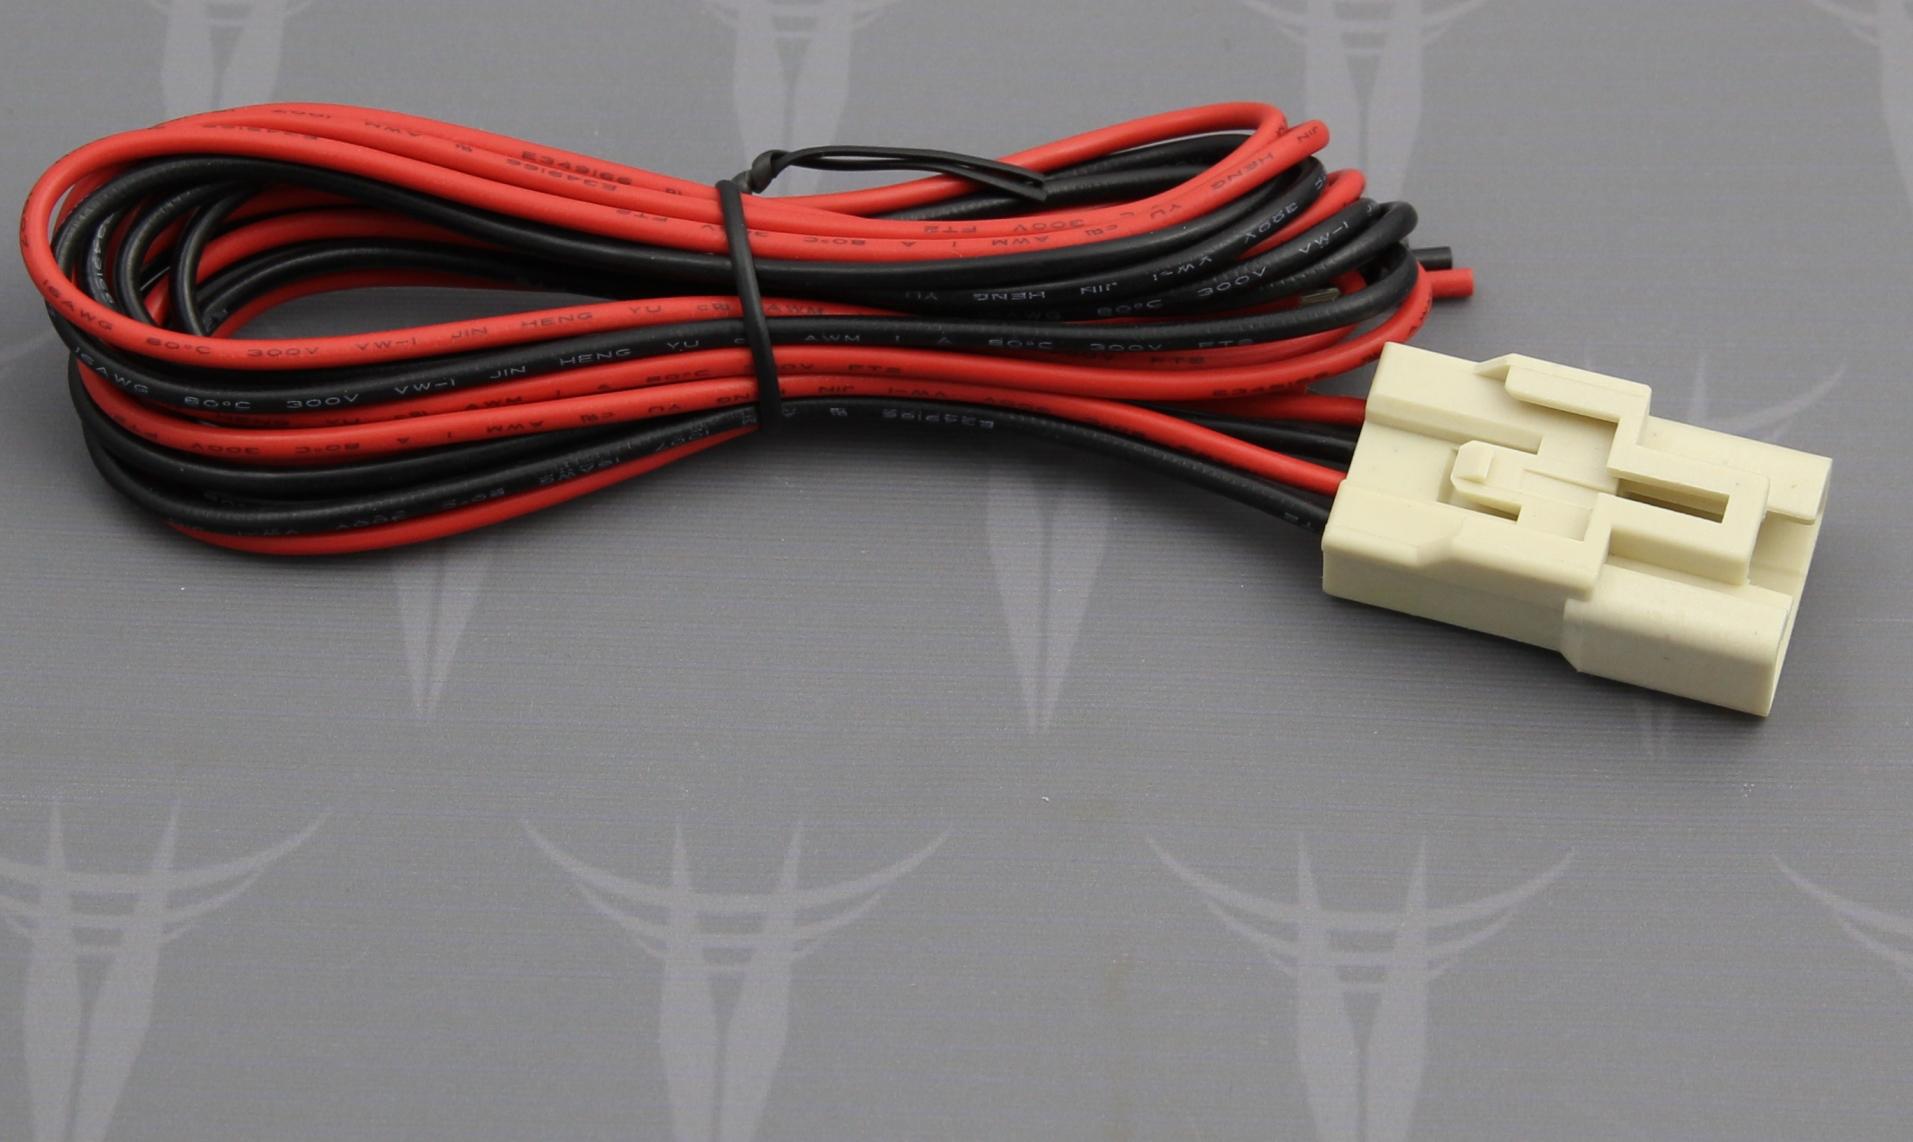 2003 2009 toyota 4runner tweeter wire harness adapters 4runner stereo wiring harness 4runner wiring harness diagram